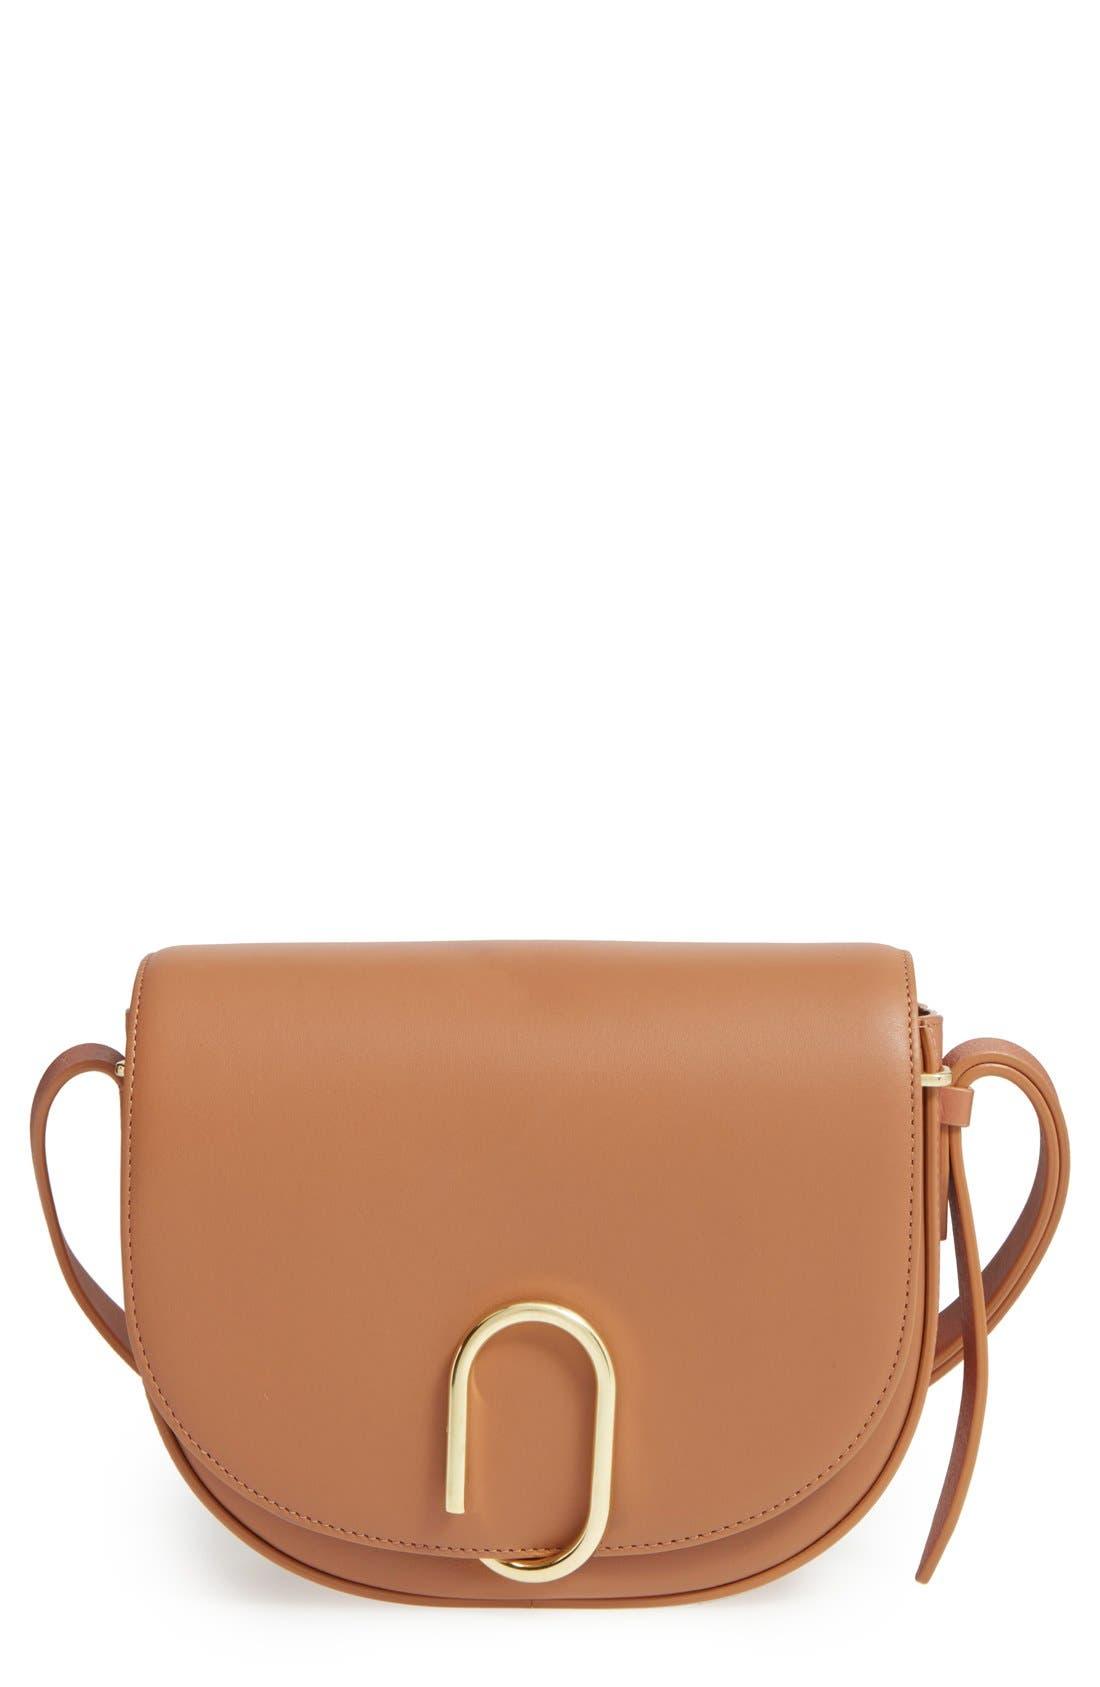 Alix Leather Saddle Bag,                             Main thumbnail 1, color,                             Camel